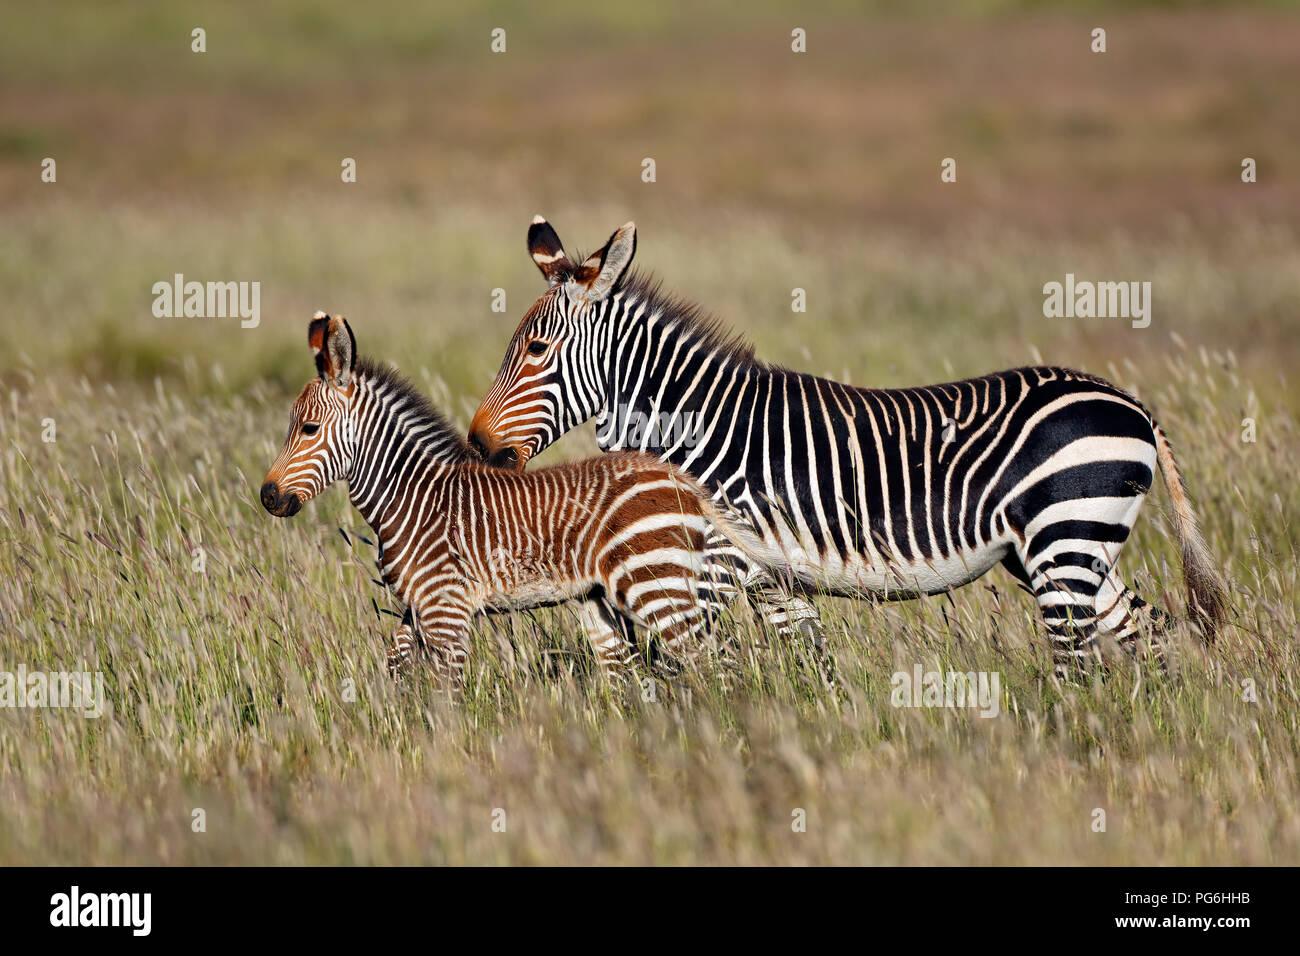 Cape mountain zebra (Equus zebra) mare with foal, Mountain Zebra National Park, South Africa - Stock Image